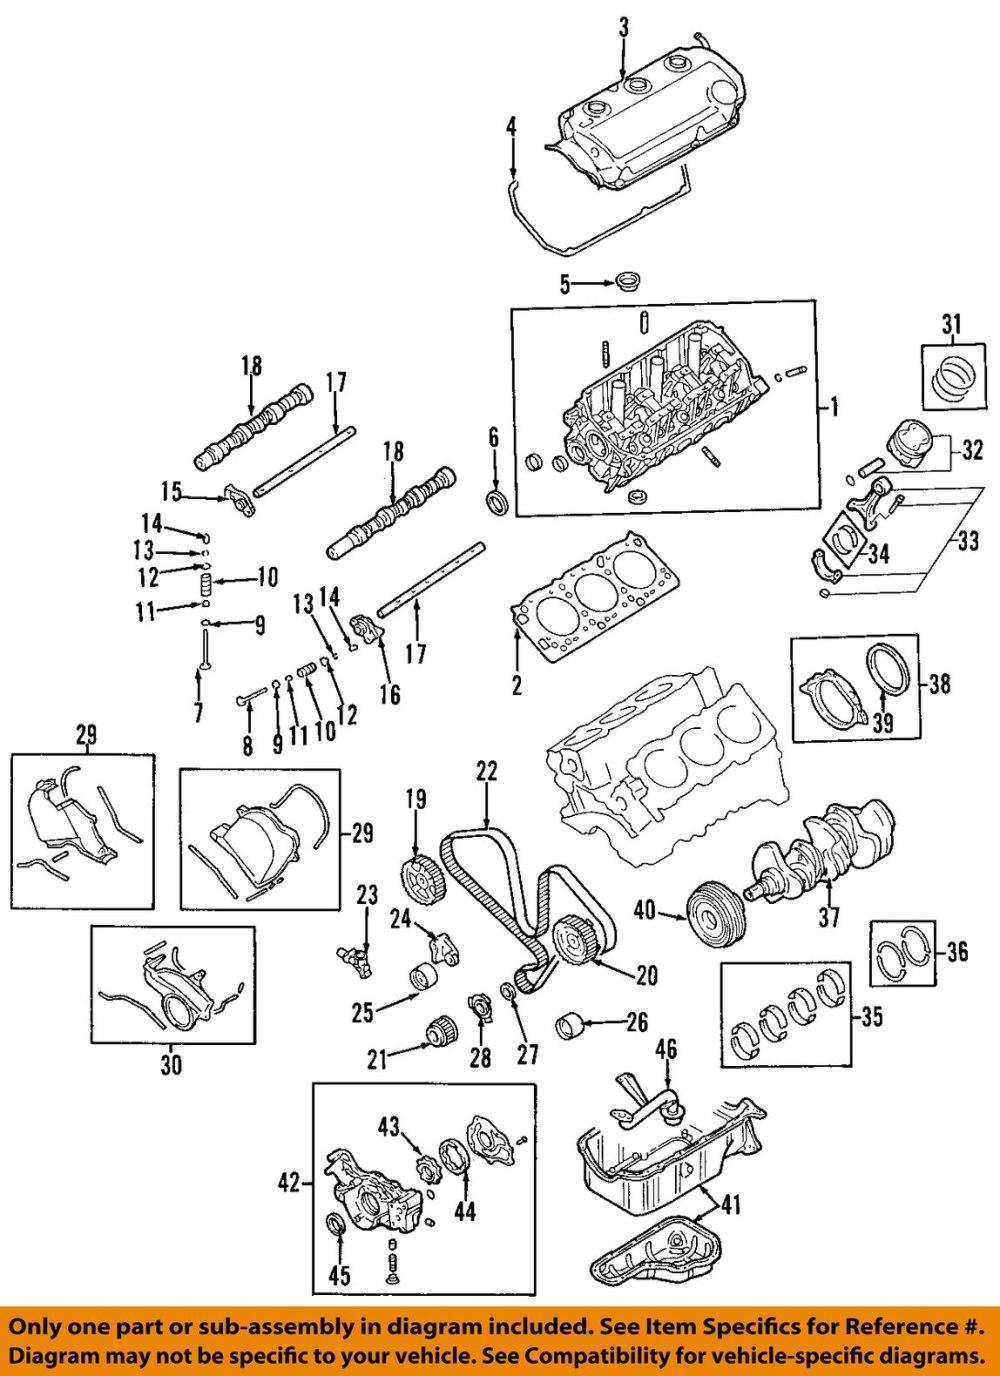 medium resolution of wiring drawling for 2003 3 0 mitsubishi engine online wiring diagrammitsubishi 6g72 wiring diagram 2 11